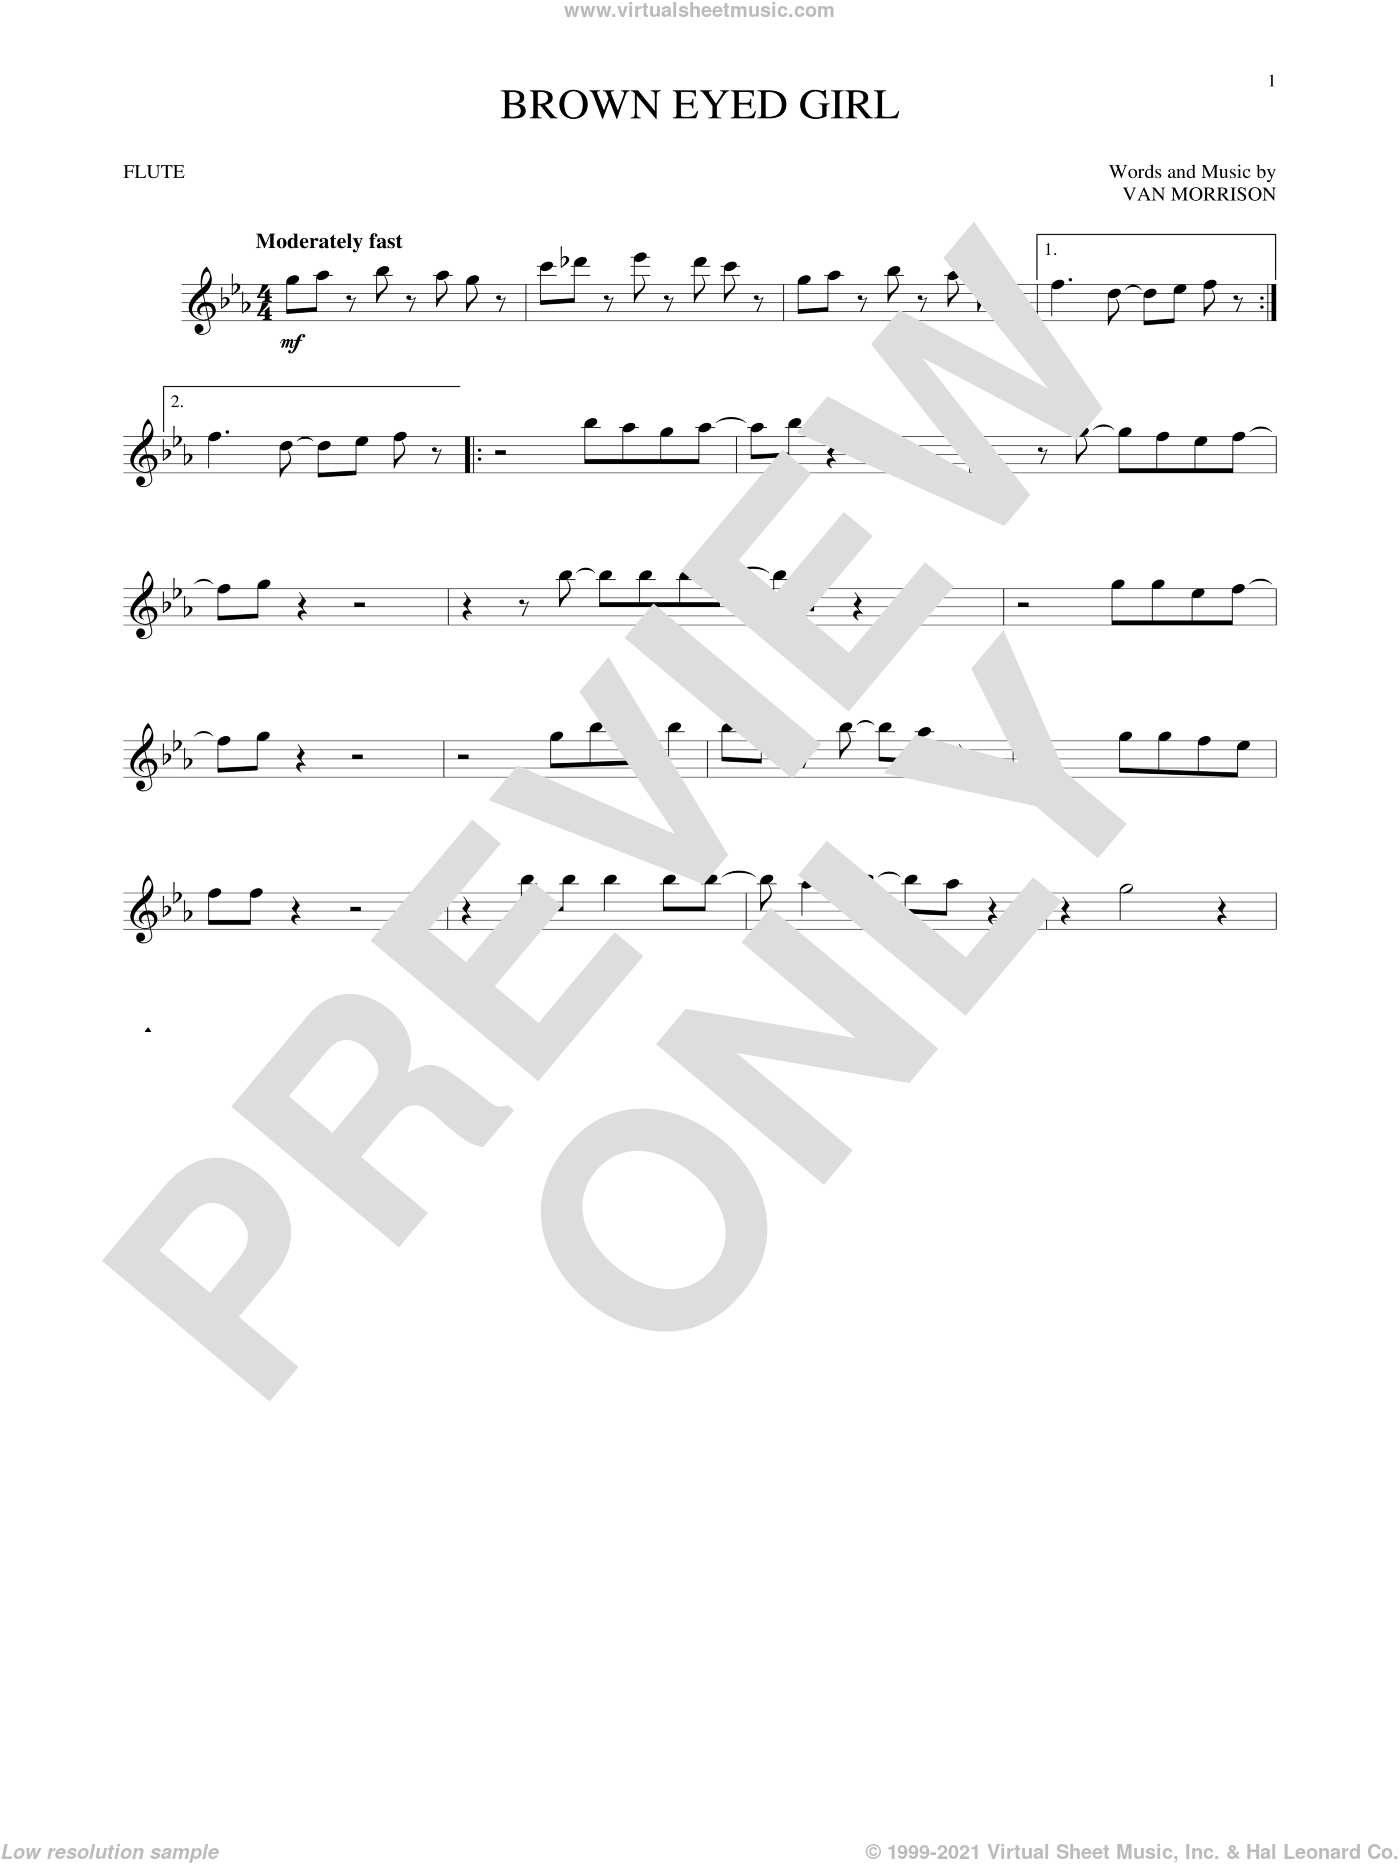 Brown Eyed Girl sheet music for flute solo by Van Morrison, intermediate skill level